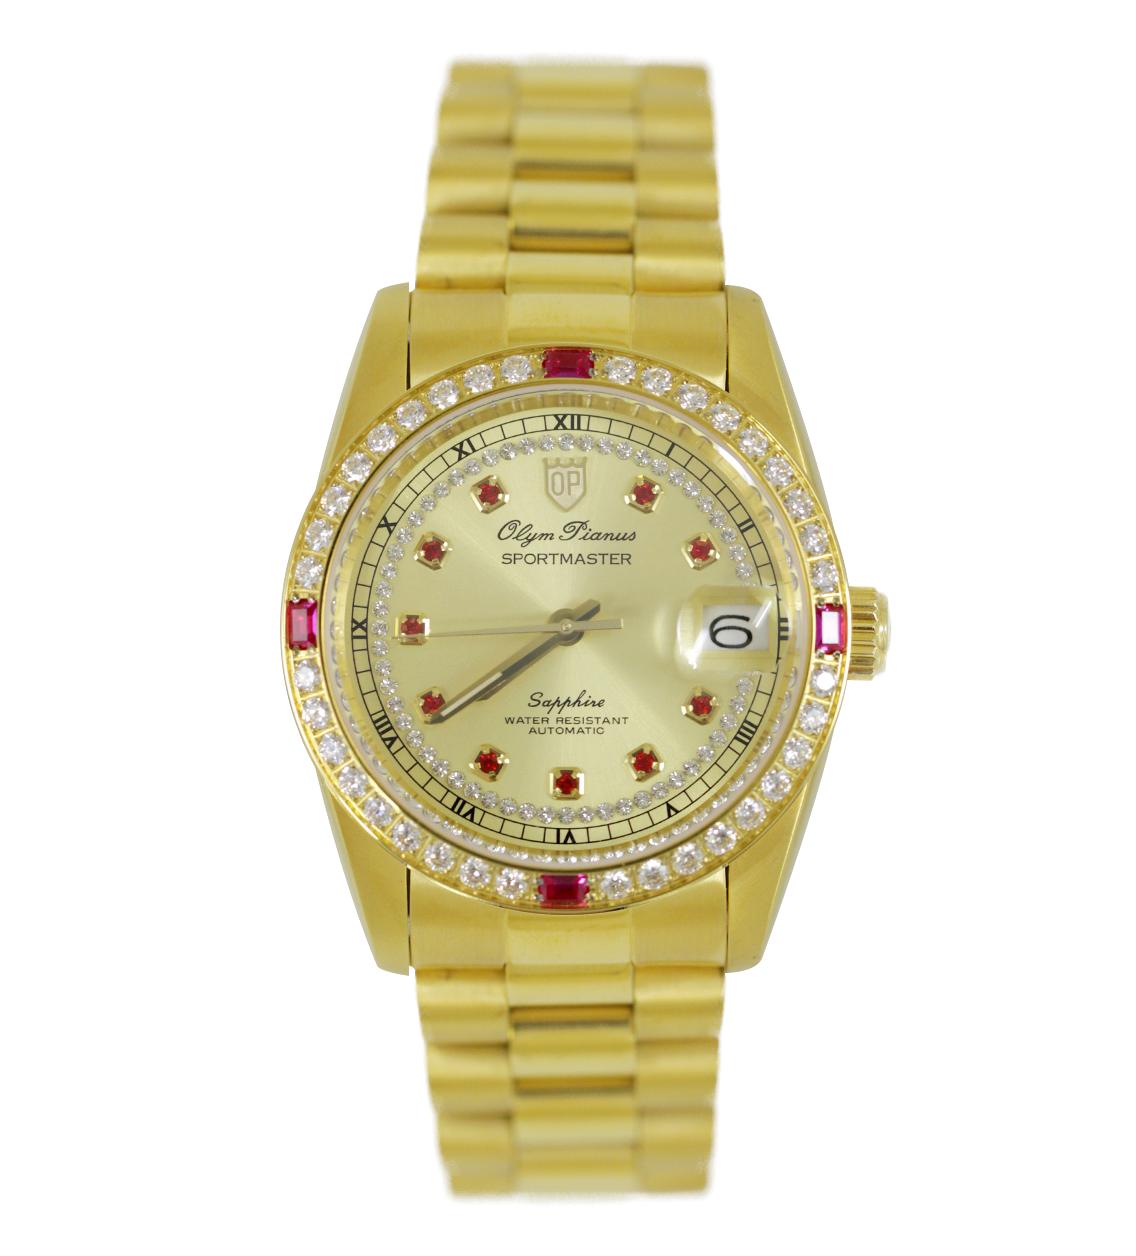 Đồng hồ OLYM PIANUS nam viền đá OP89322DMK-V